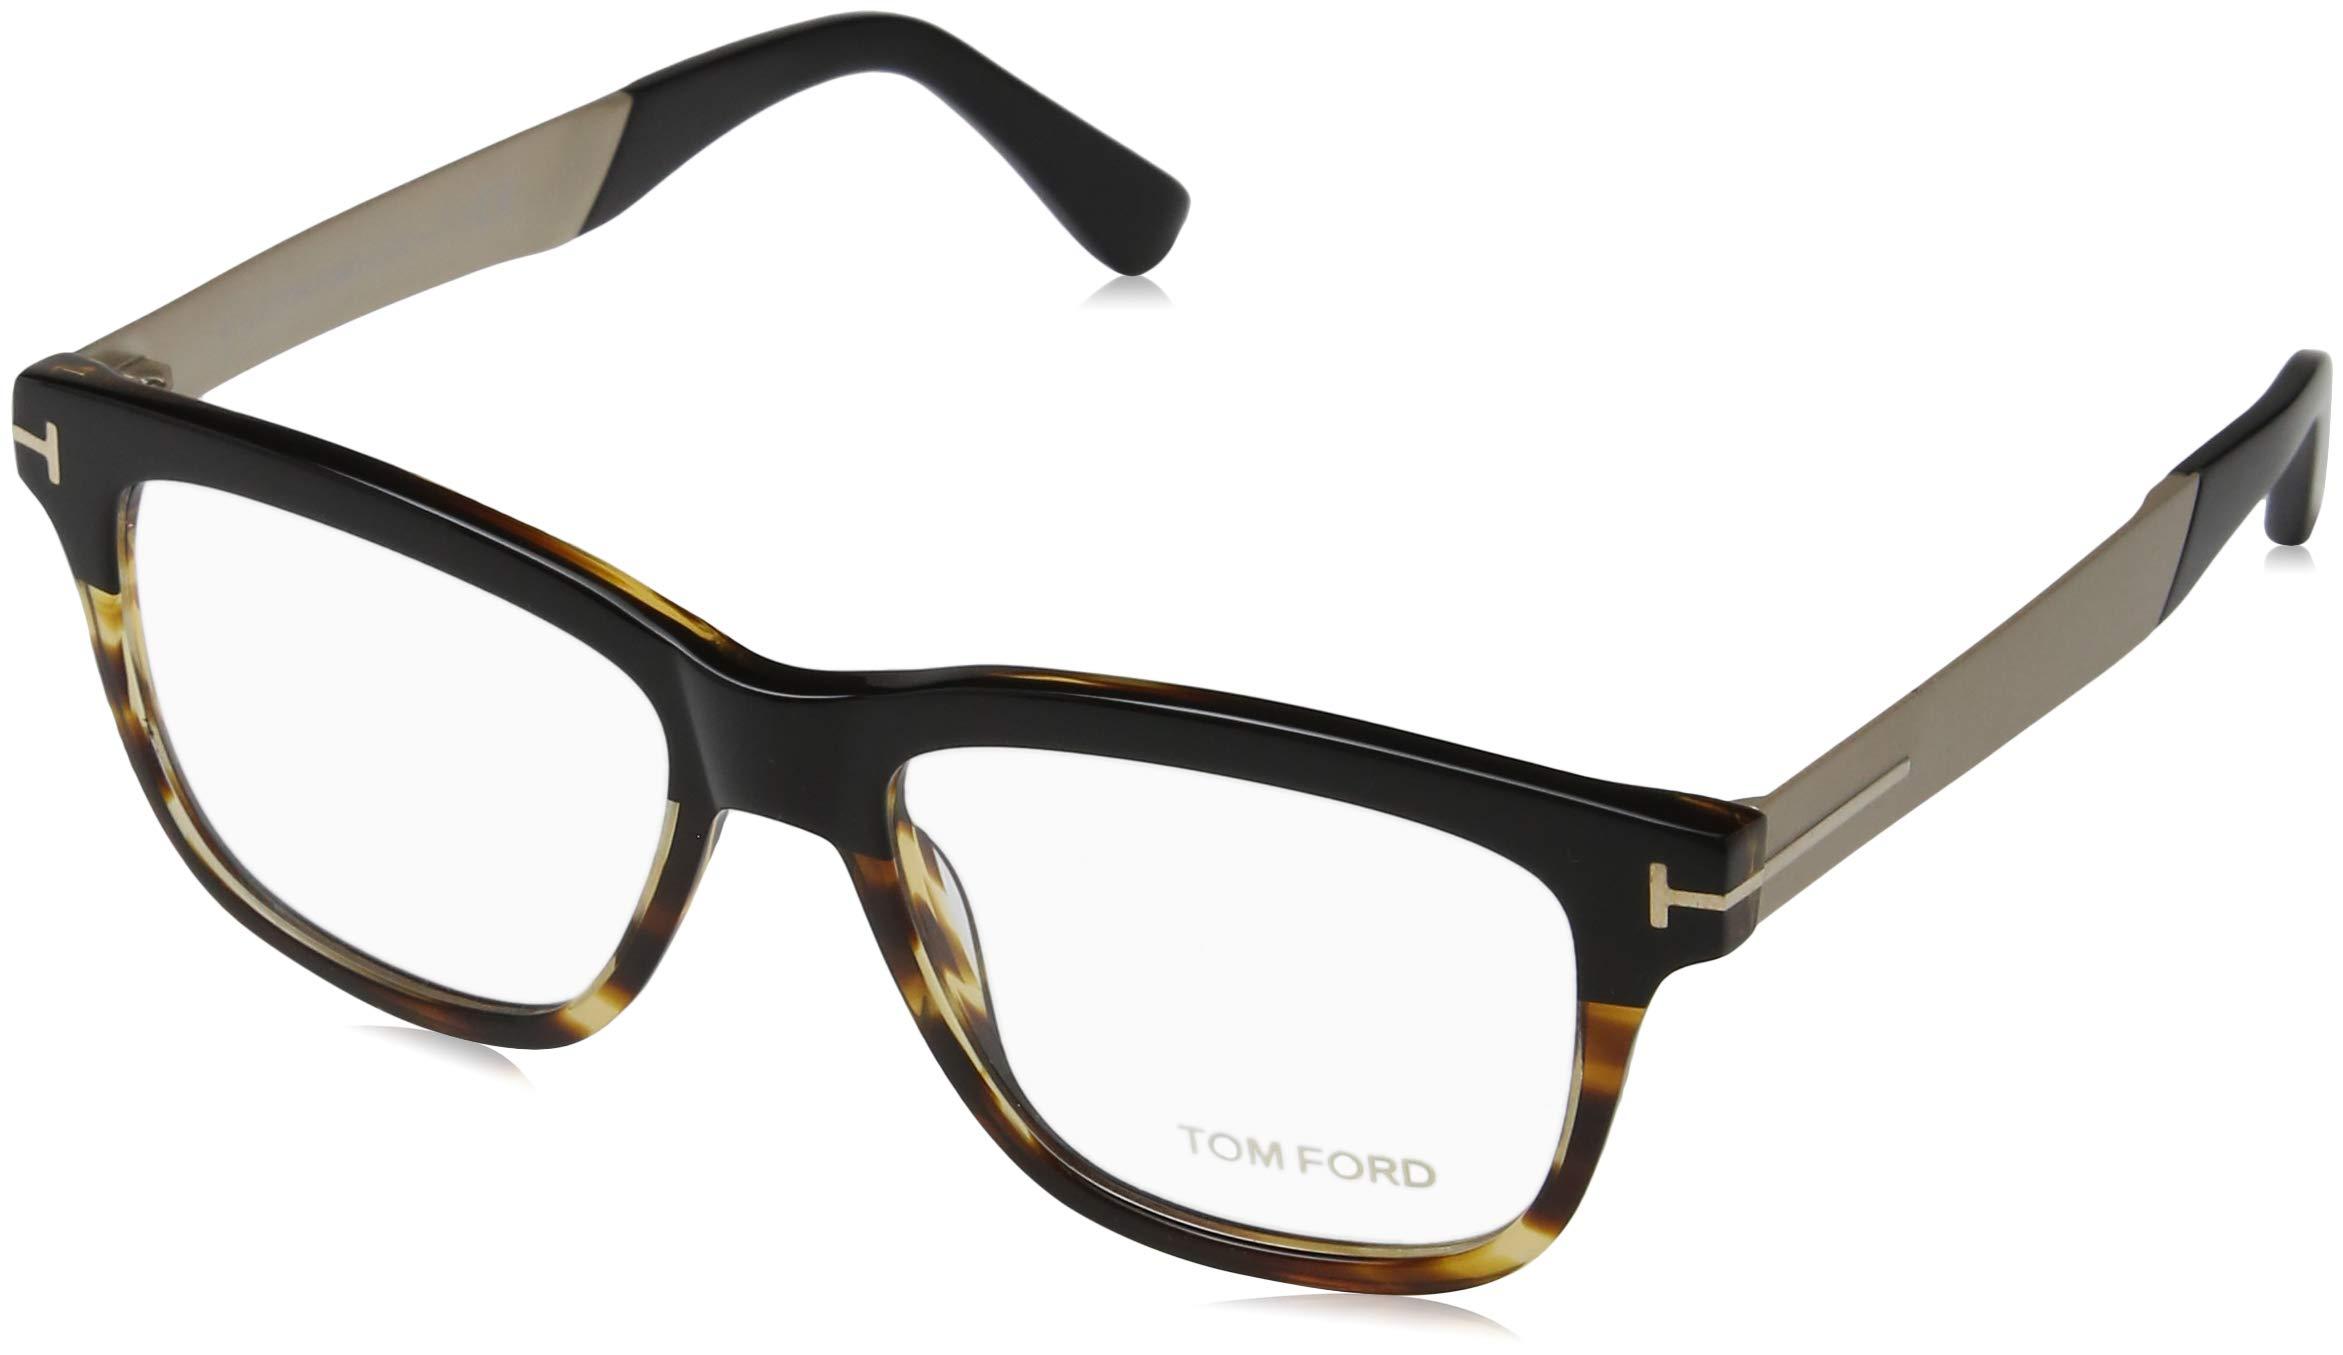 89b99a5e9c003 TOM FORD Eyeglasses FT5372 005 Black